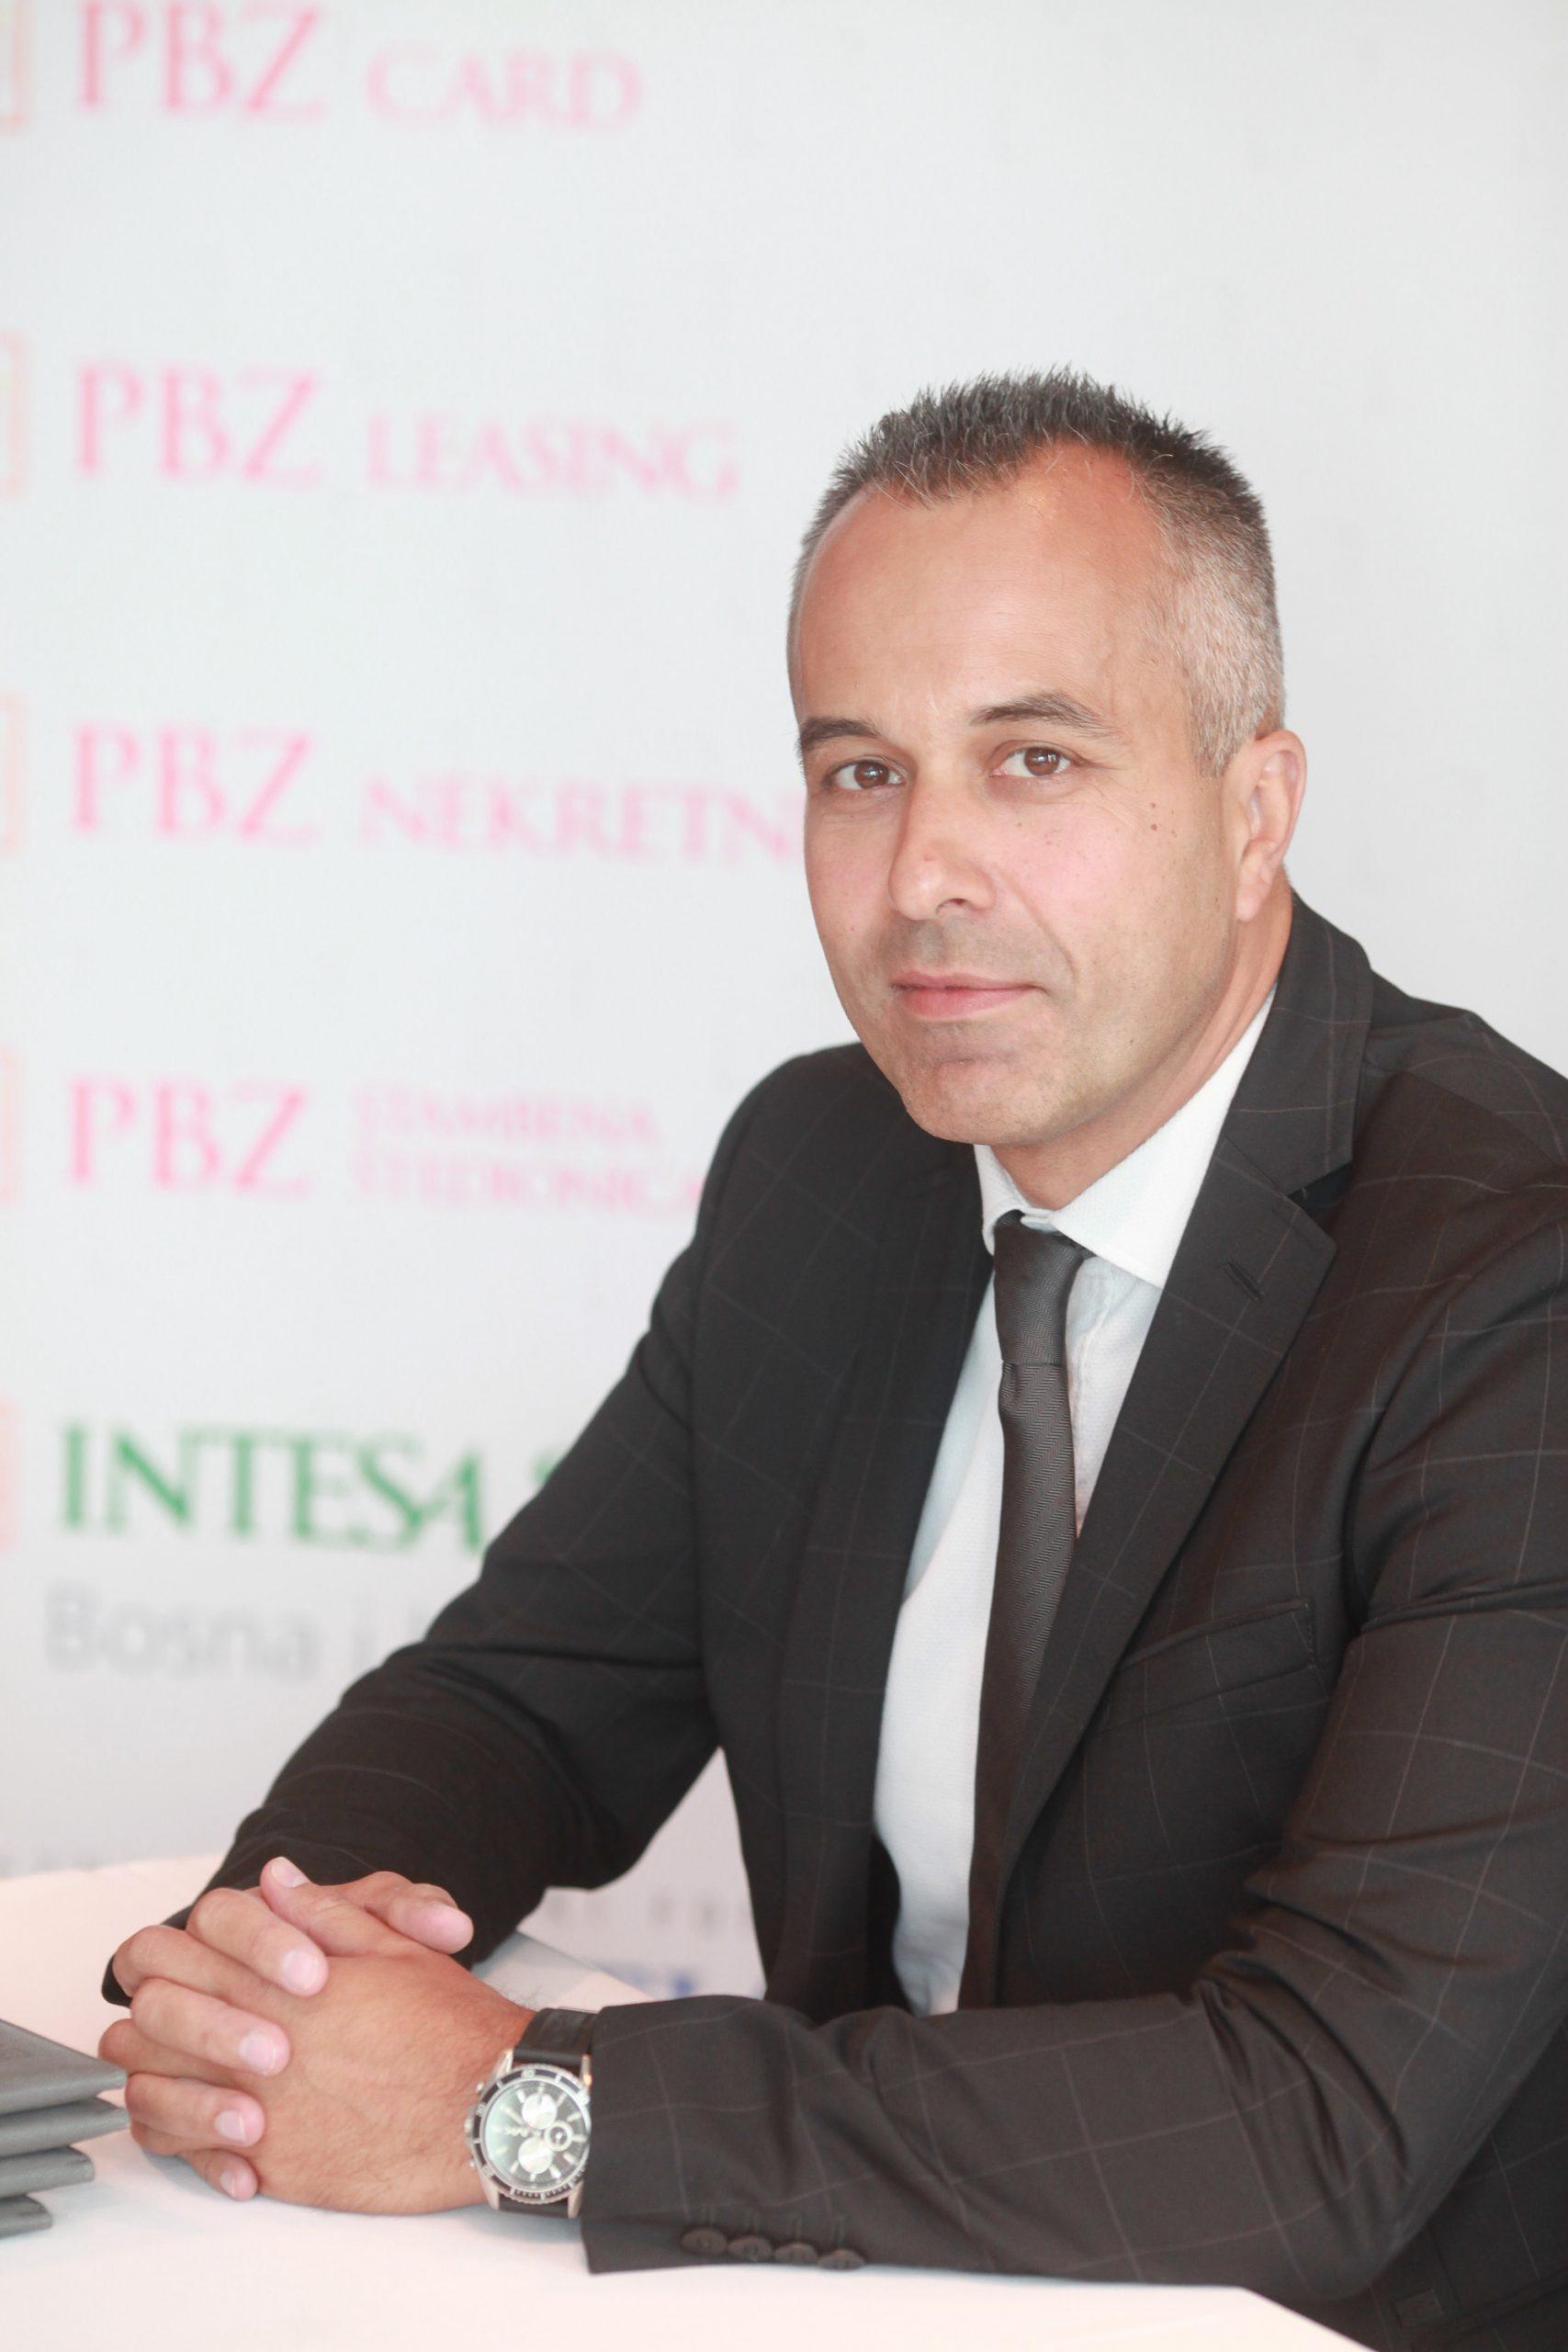 Miroslav Halužan, Senior Executive Director of Human Resources and Organization, Privredna banka Zagreb 1 - hrpsor Hrvatski poslovni savjet za održivi razvoj